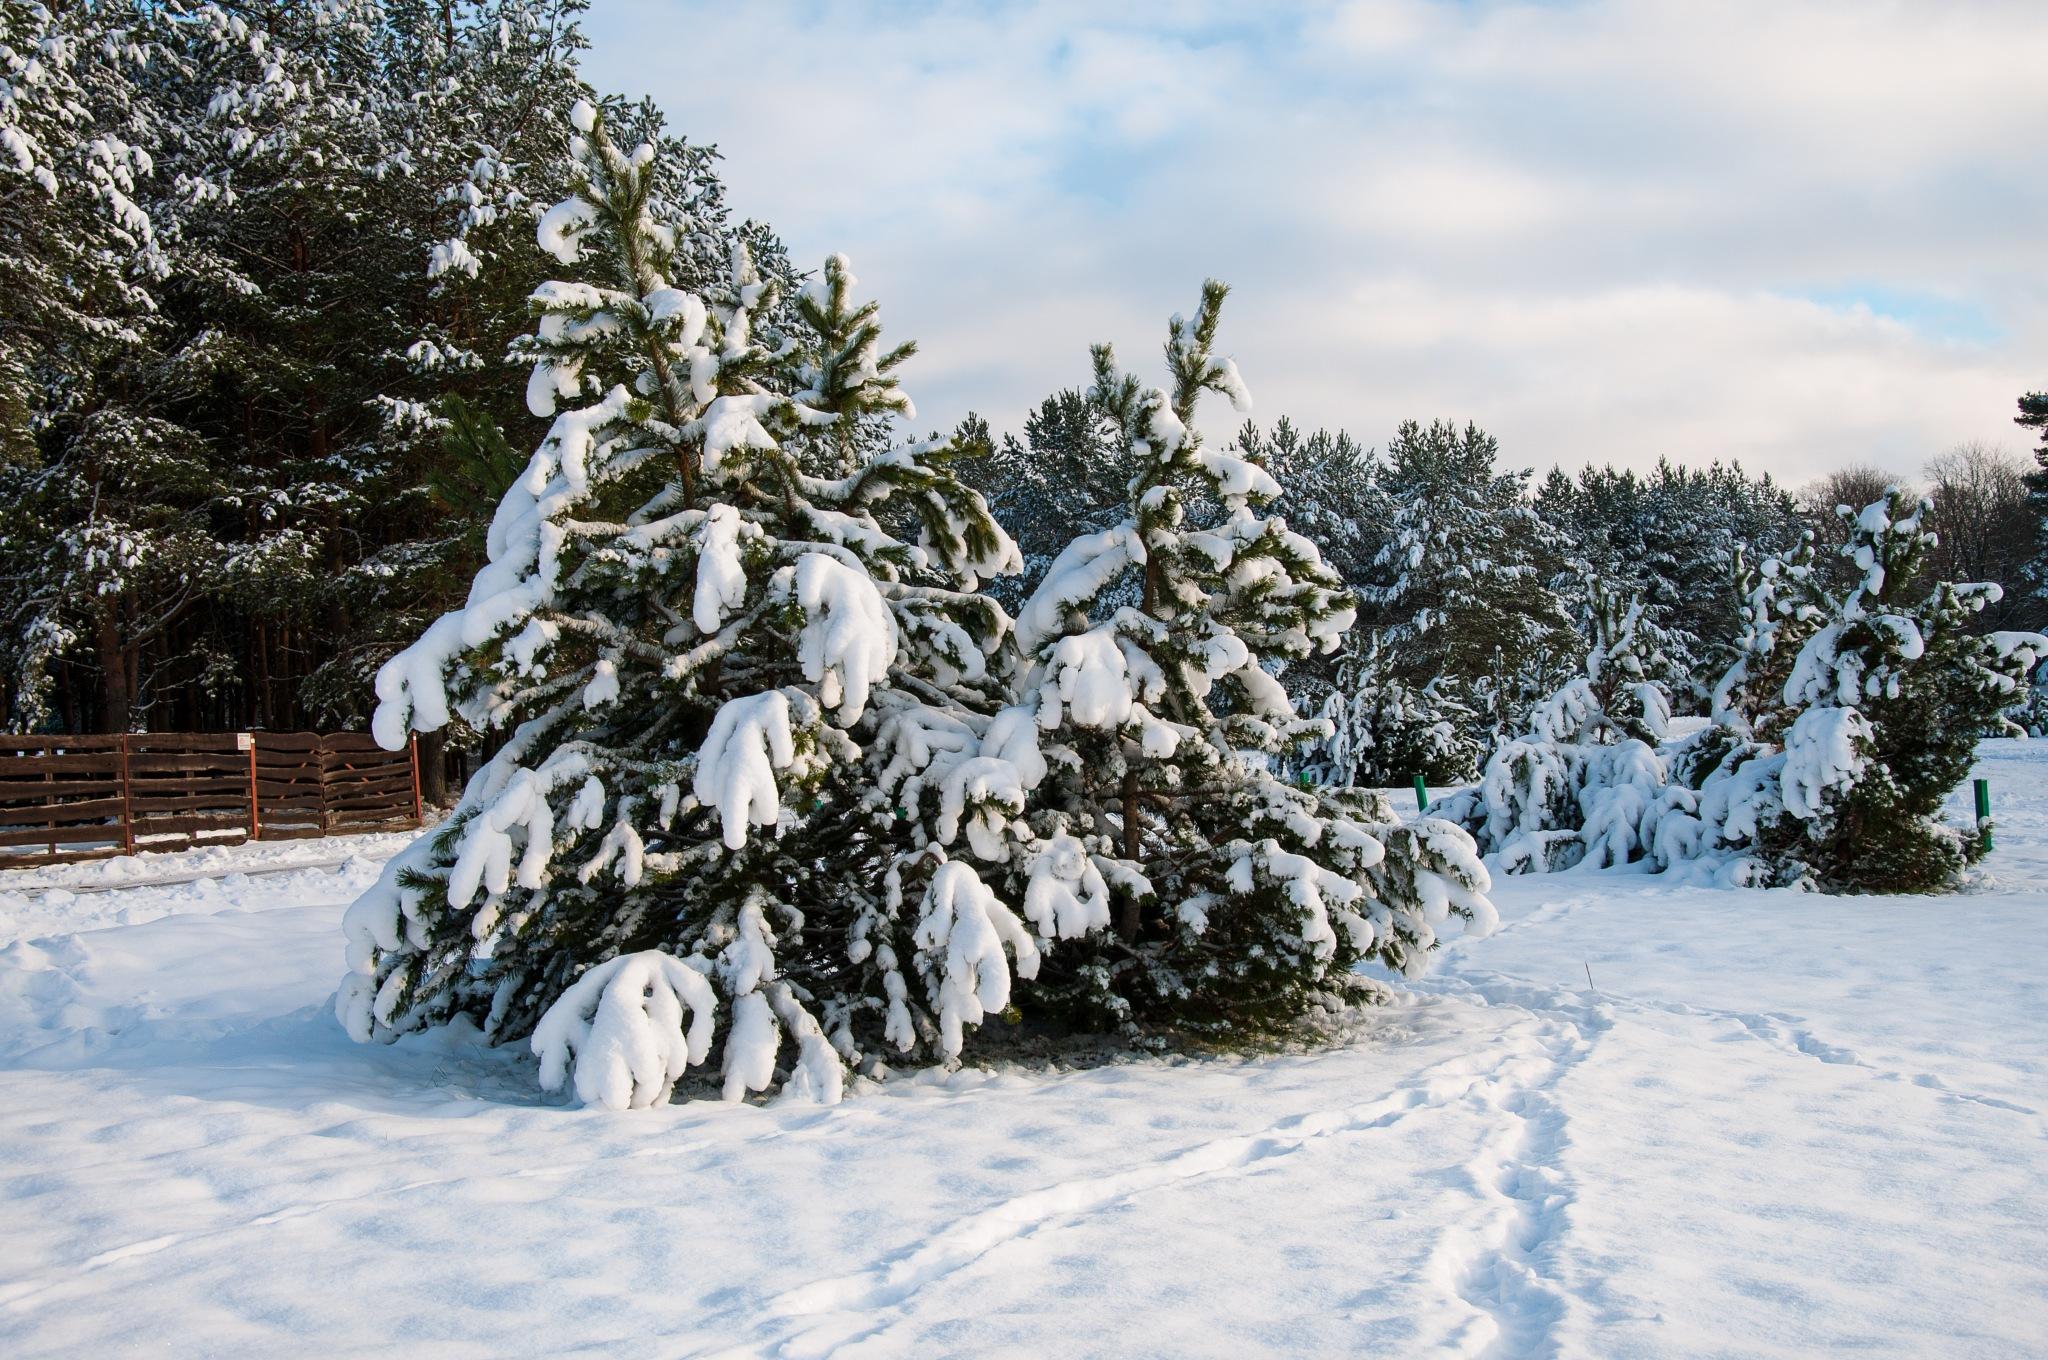 Early winter by Irena Gedgaudiene